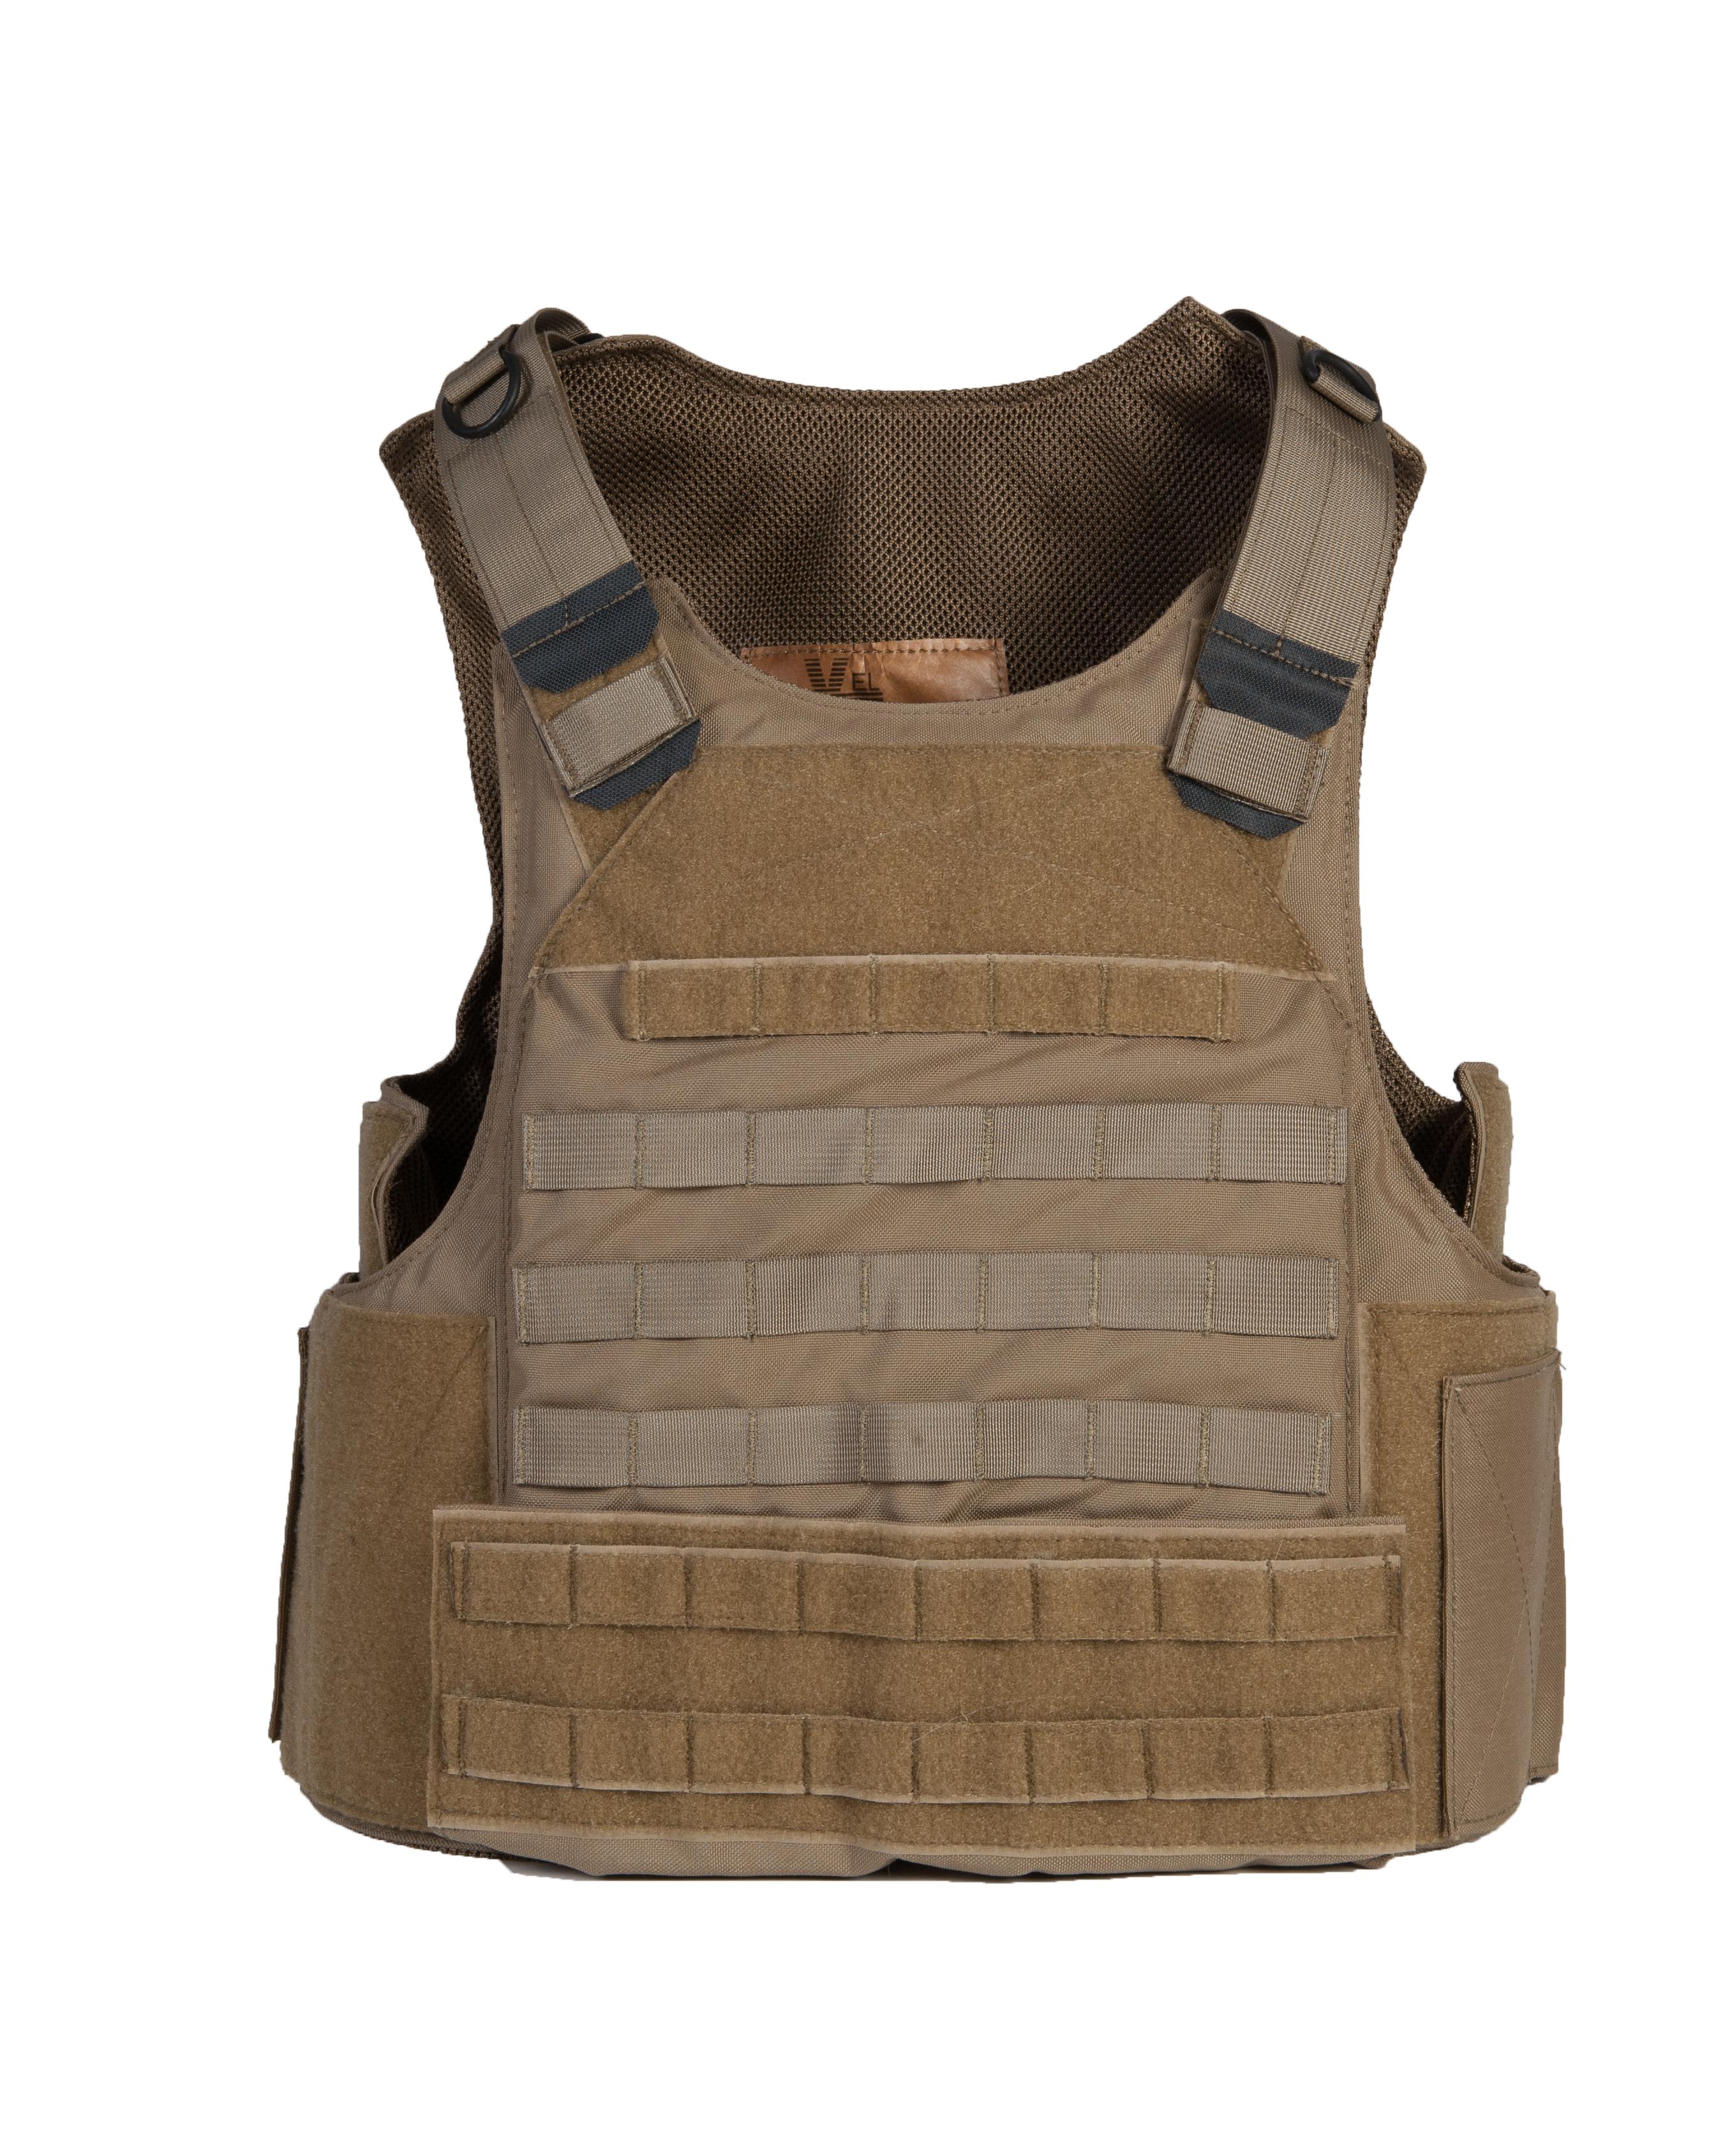 Military Hugger Tactical Vest-